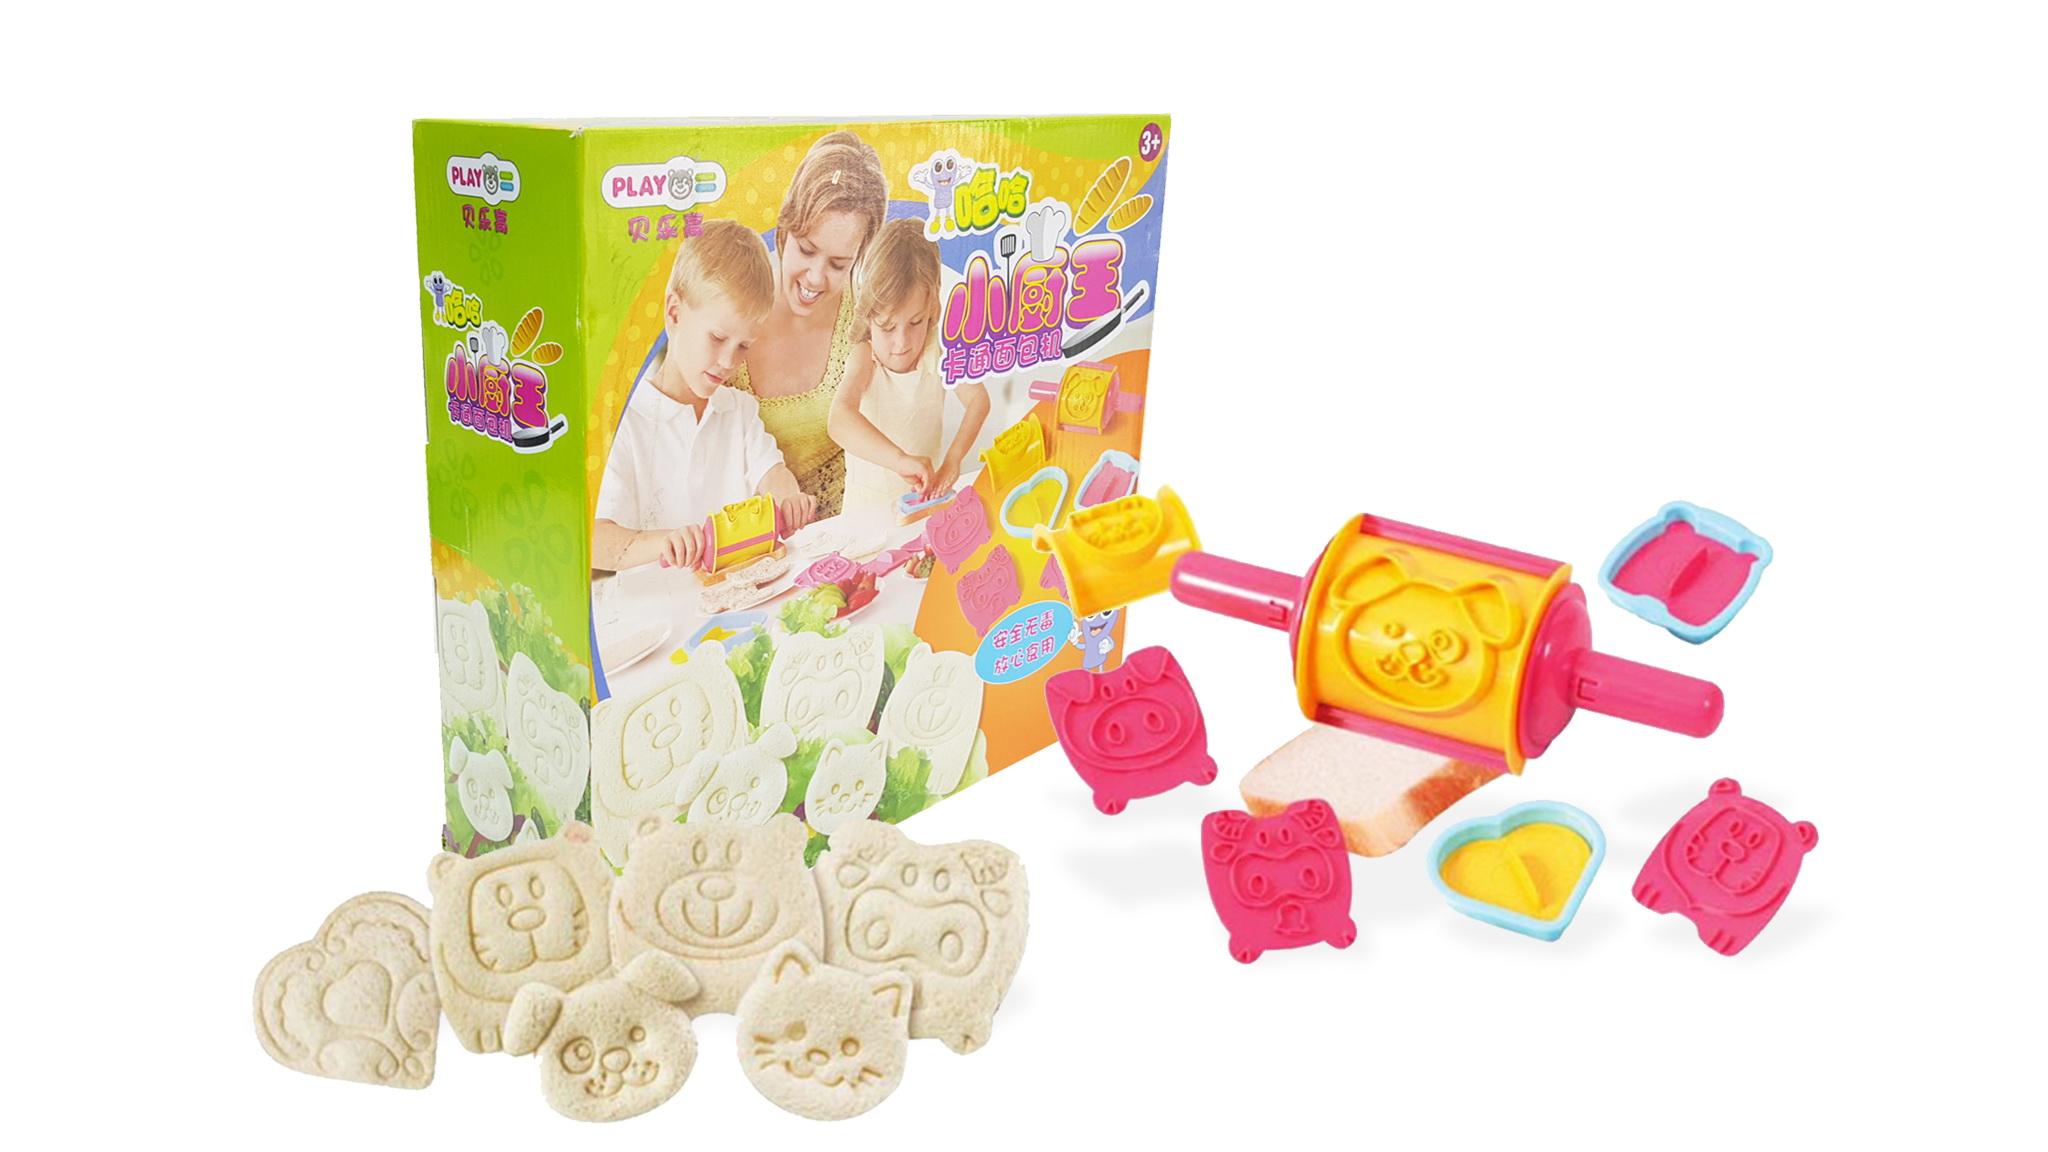 J010 ของเล่นนำเข้า ของเล่นญี่ปุ่น fun cooking แซนวิชรูปสัตว์ (ทำได้จริง)